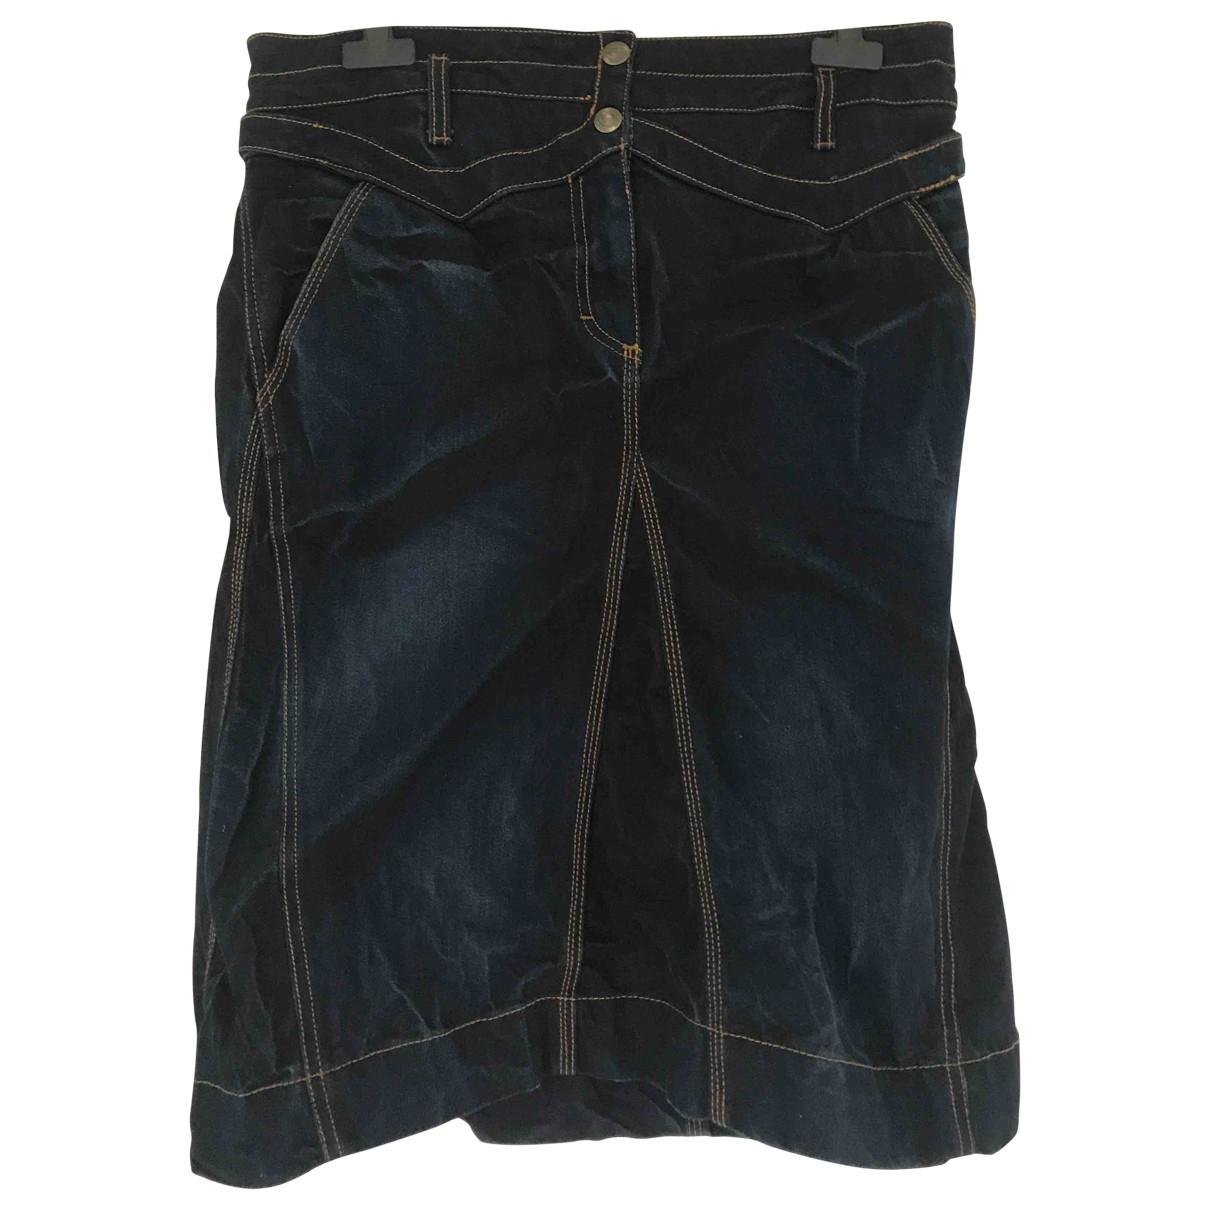 Just Cavalli \N Blue Cotton skirt for Women 44 IT